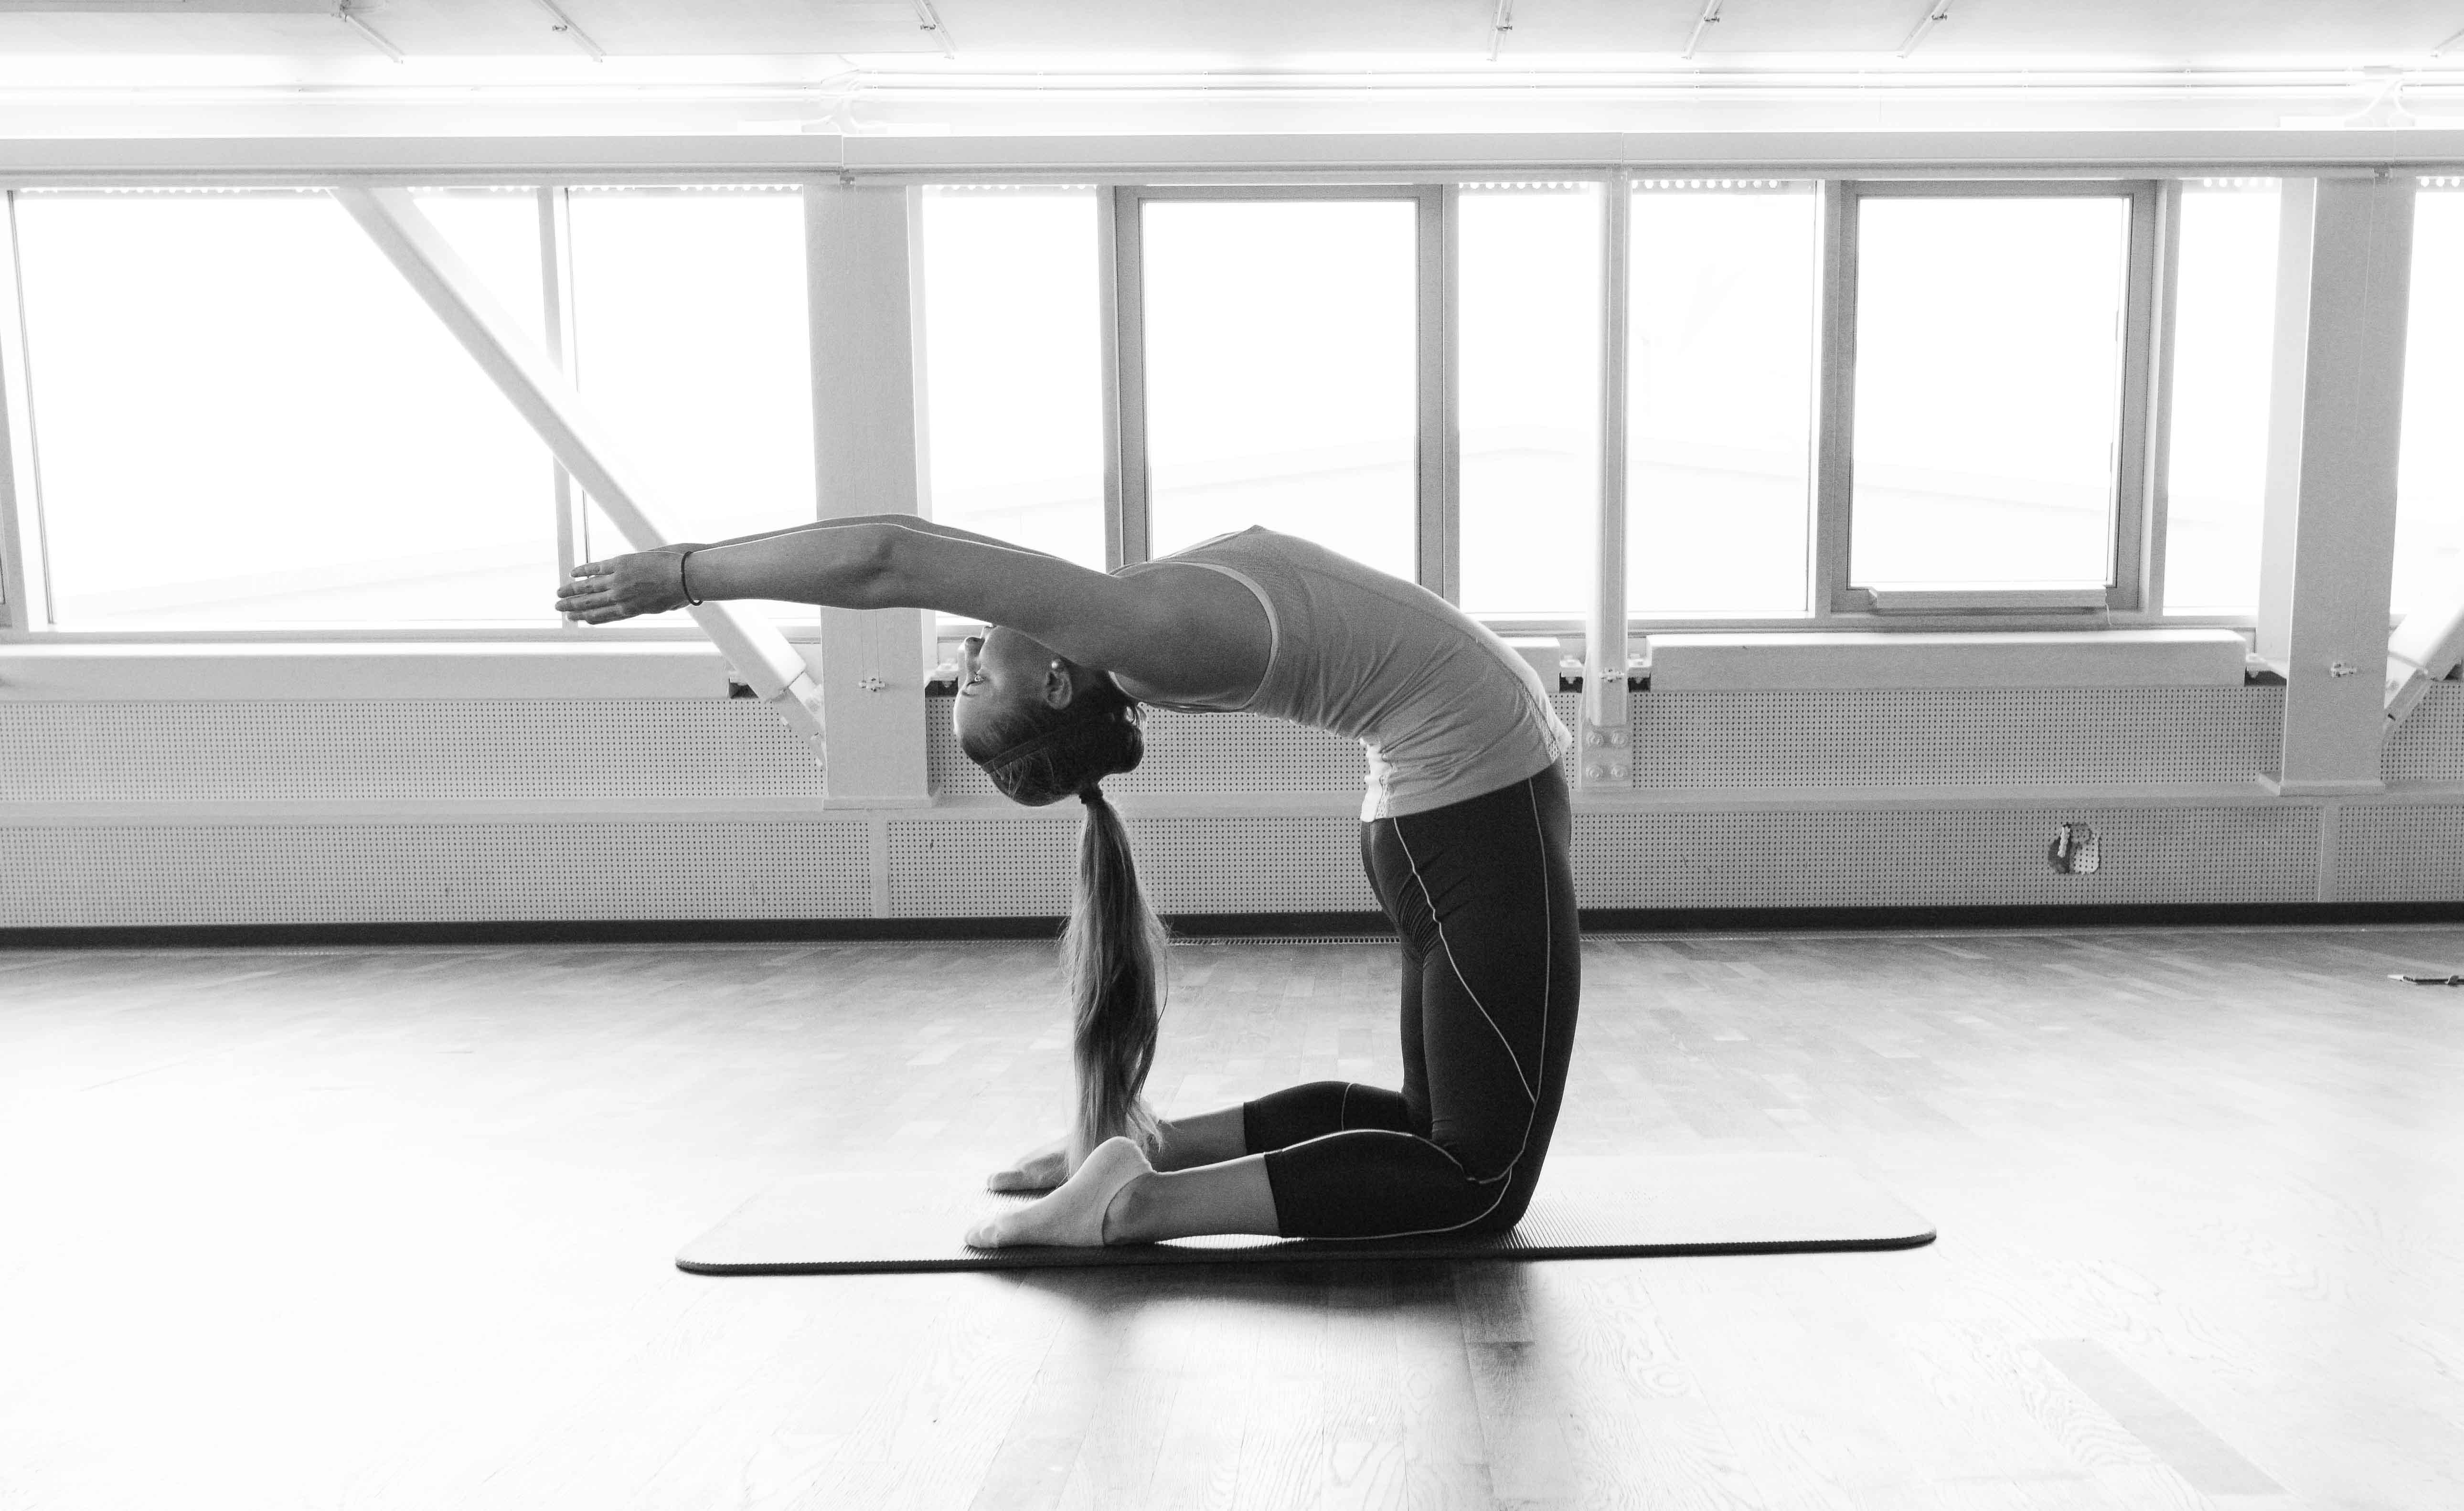 yoga zu hause top pilates ubungen fur zuhause video tag. Black Bedroom Furniture Sets. Home Design Ideas